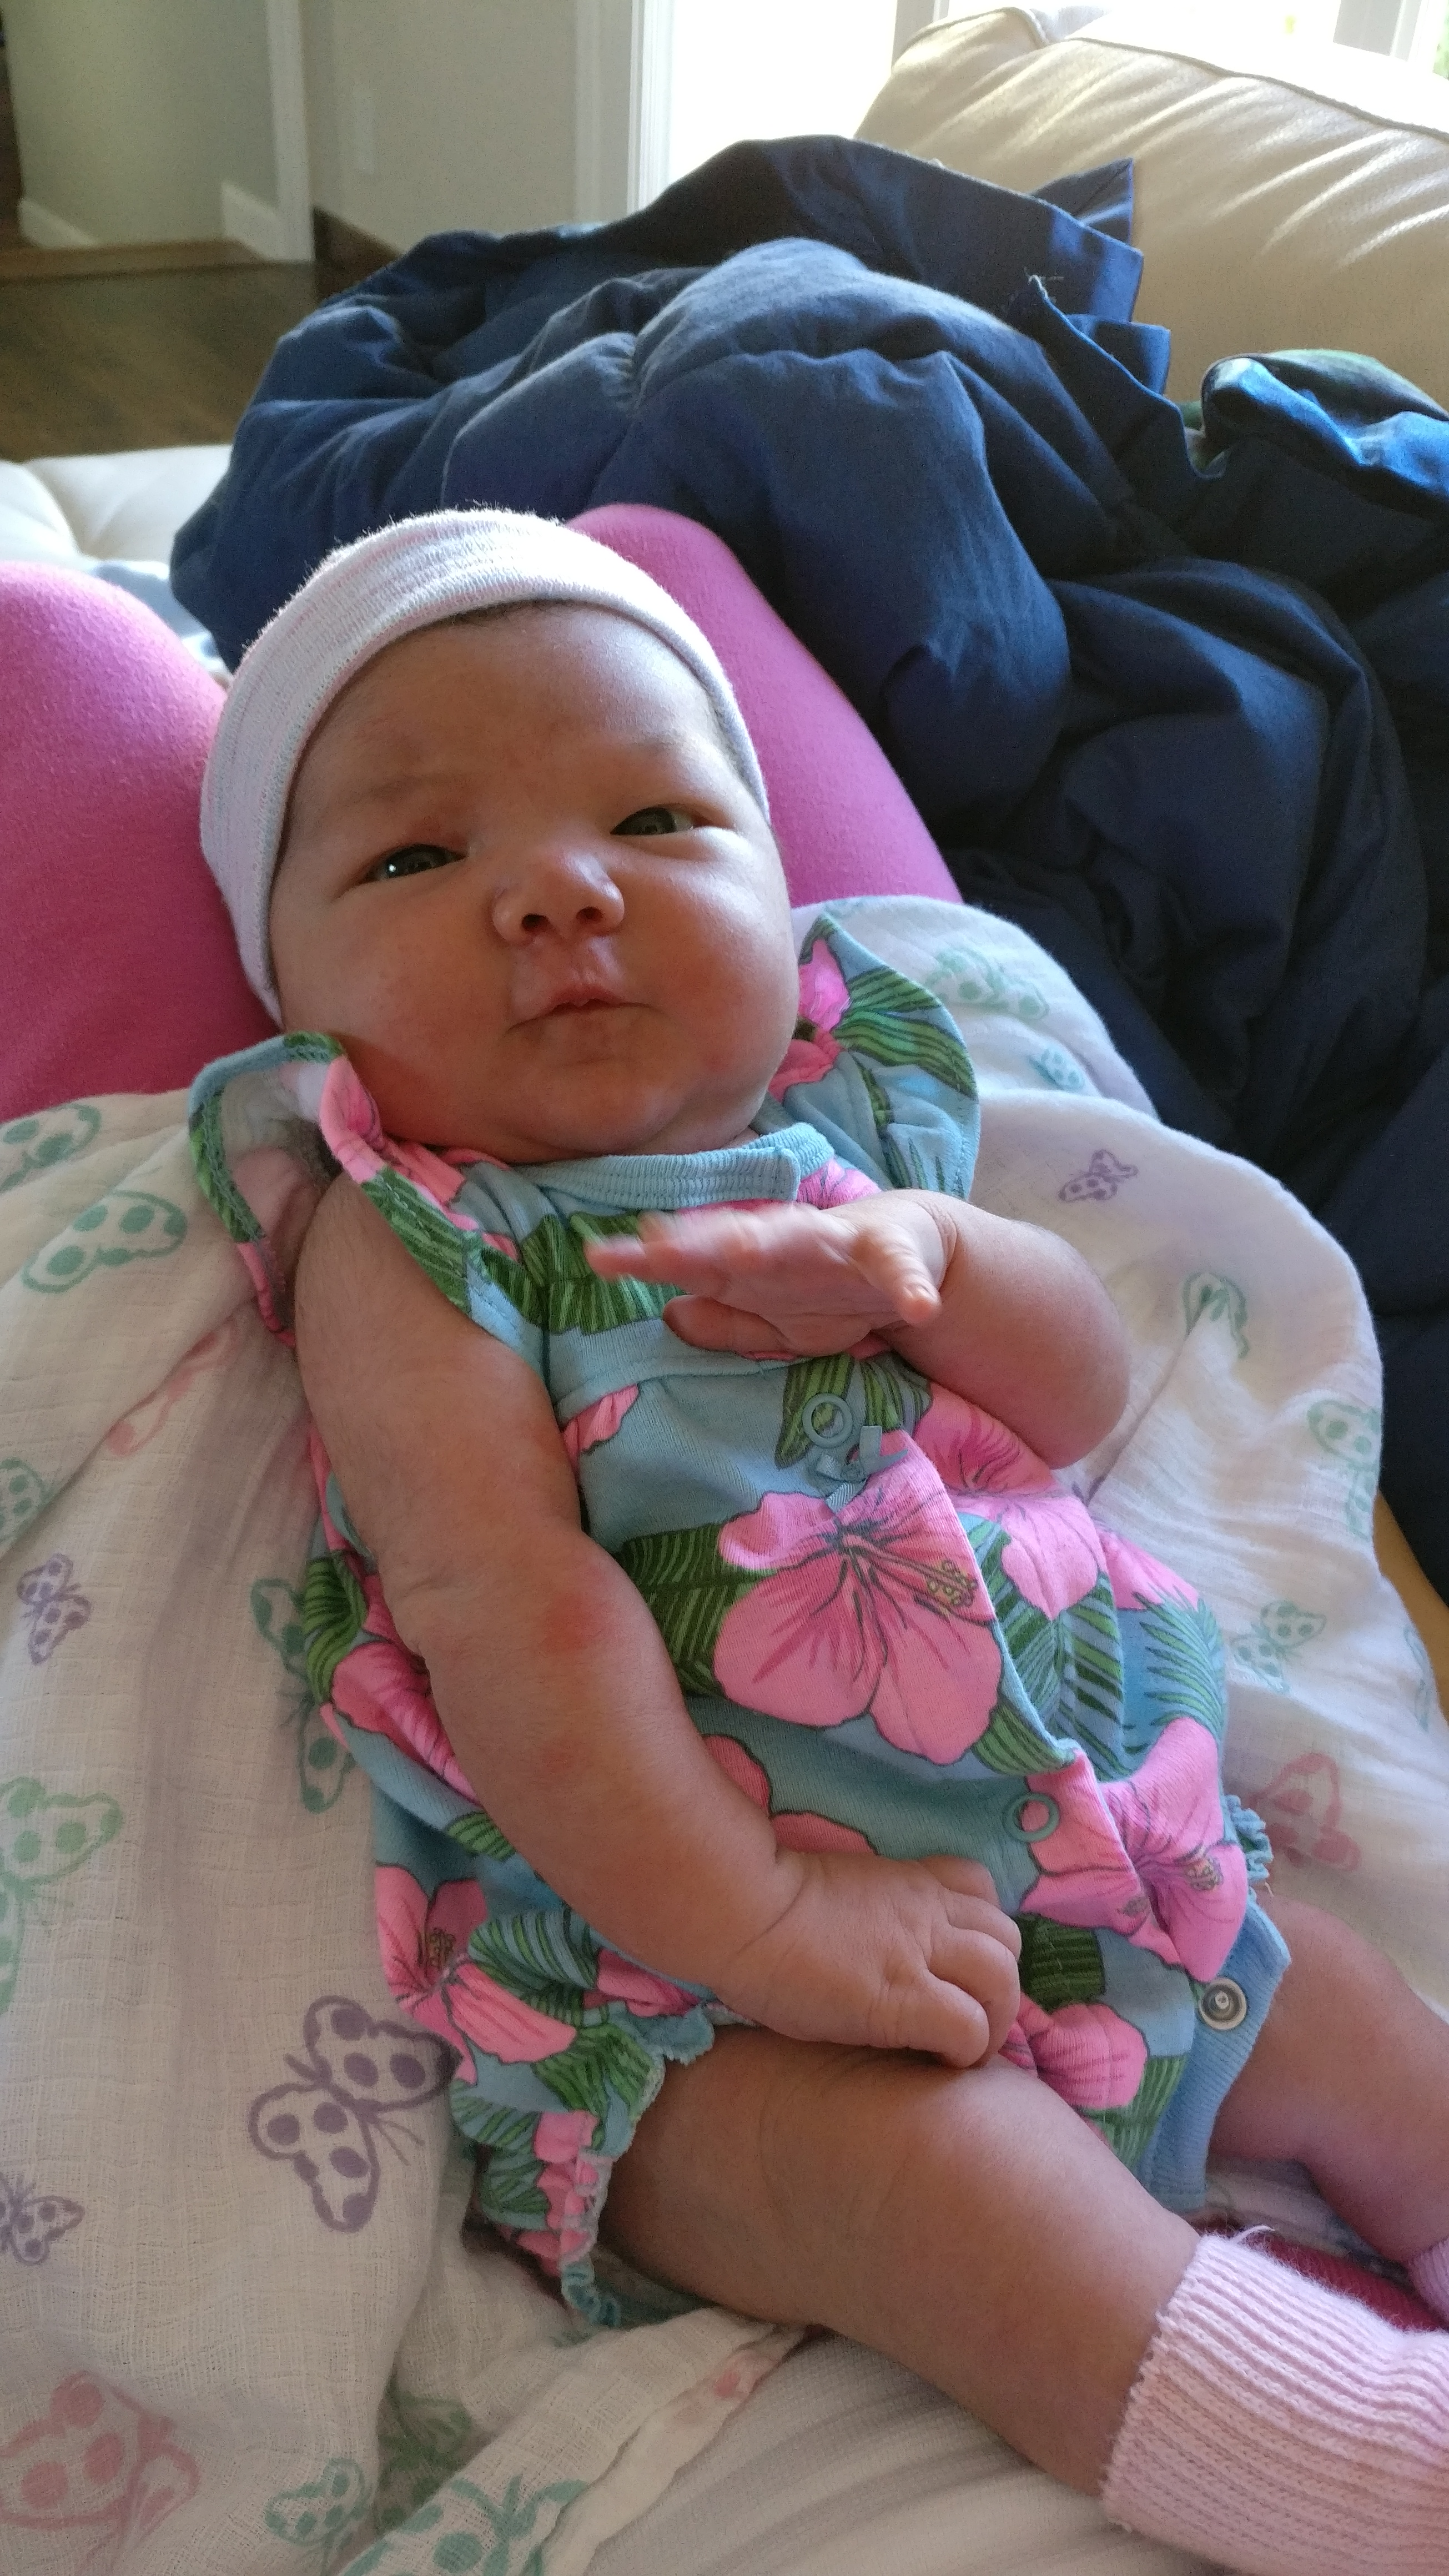 Baby Eliora Fisher-Kirshner in 2016